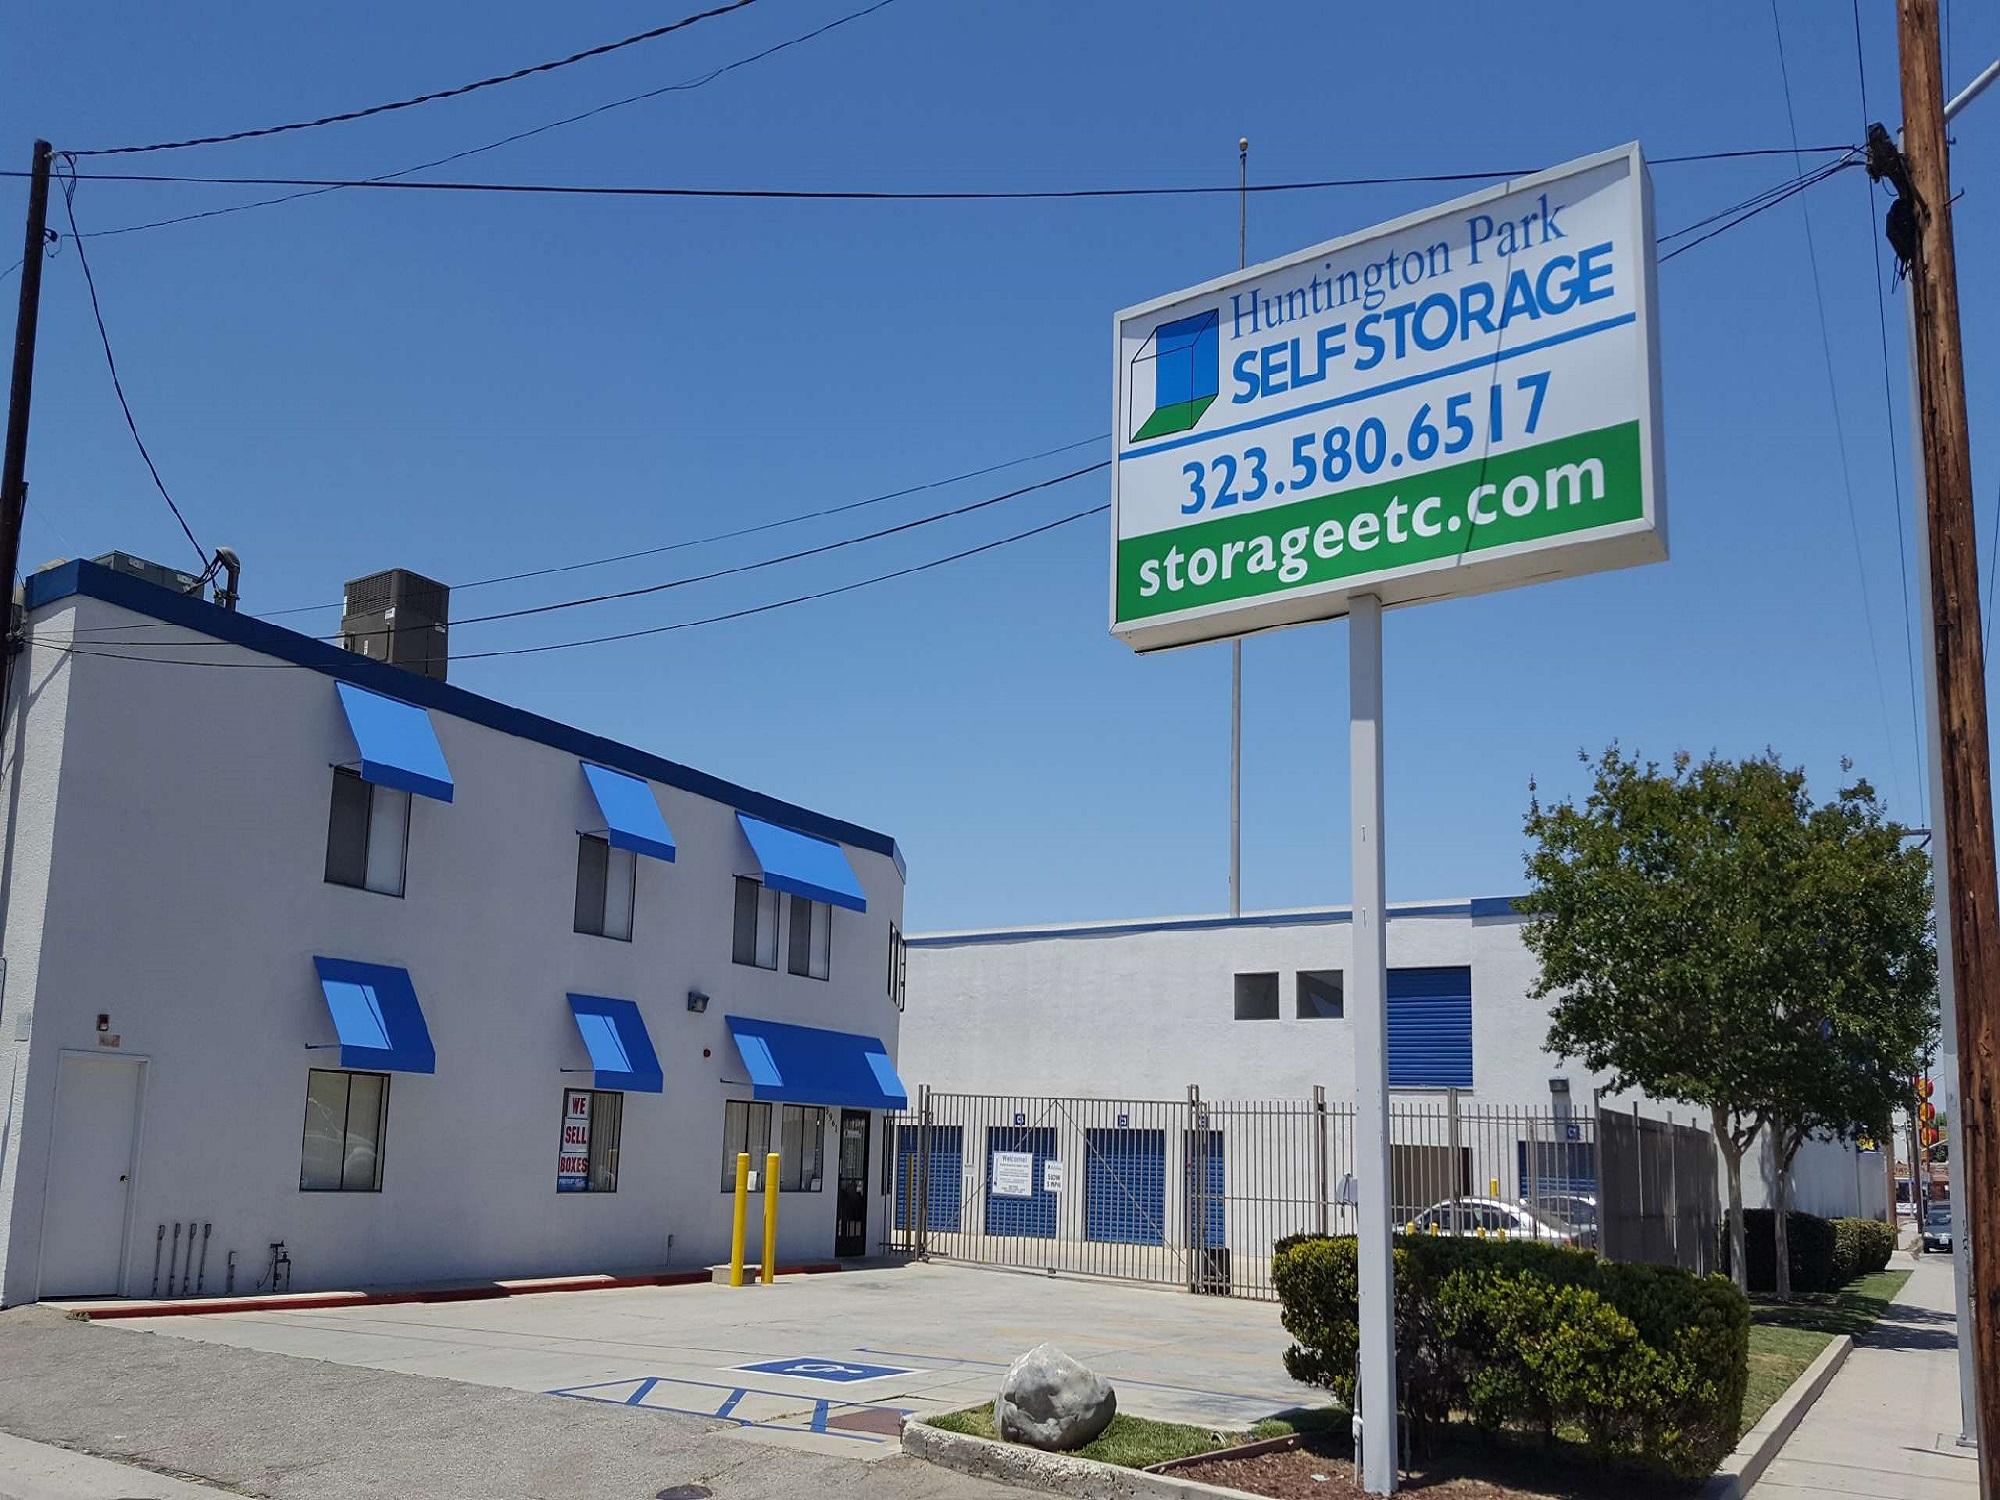 Main office at Huntington Park Self Storage